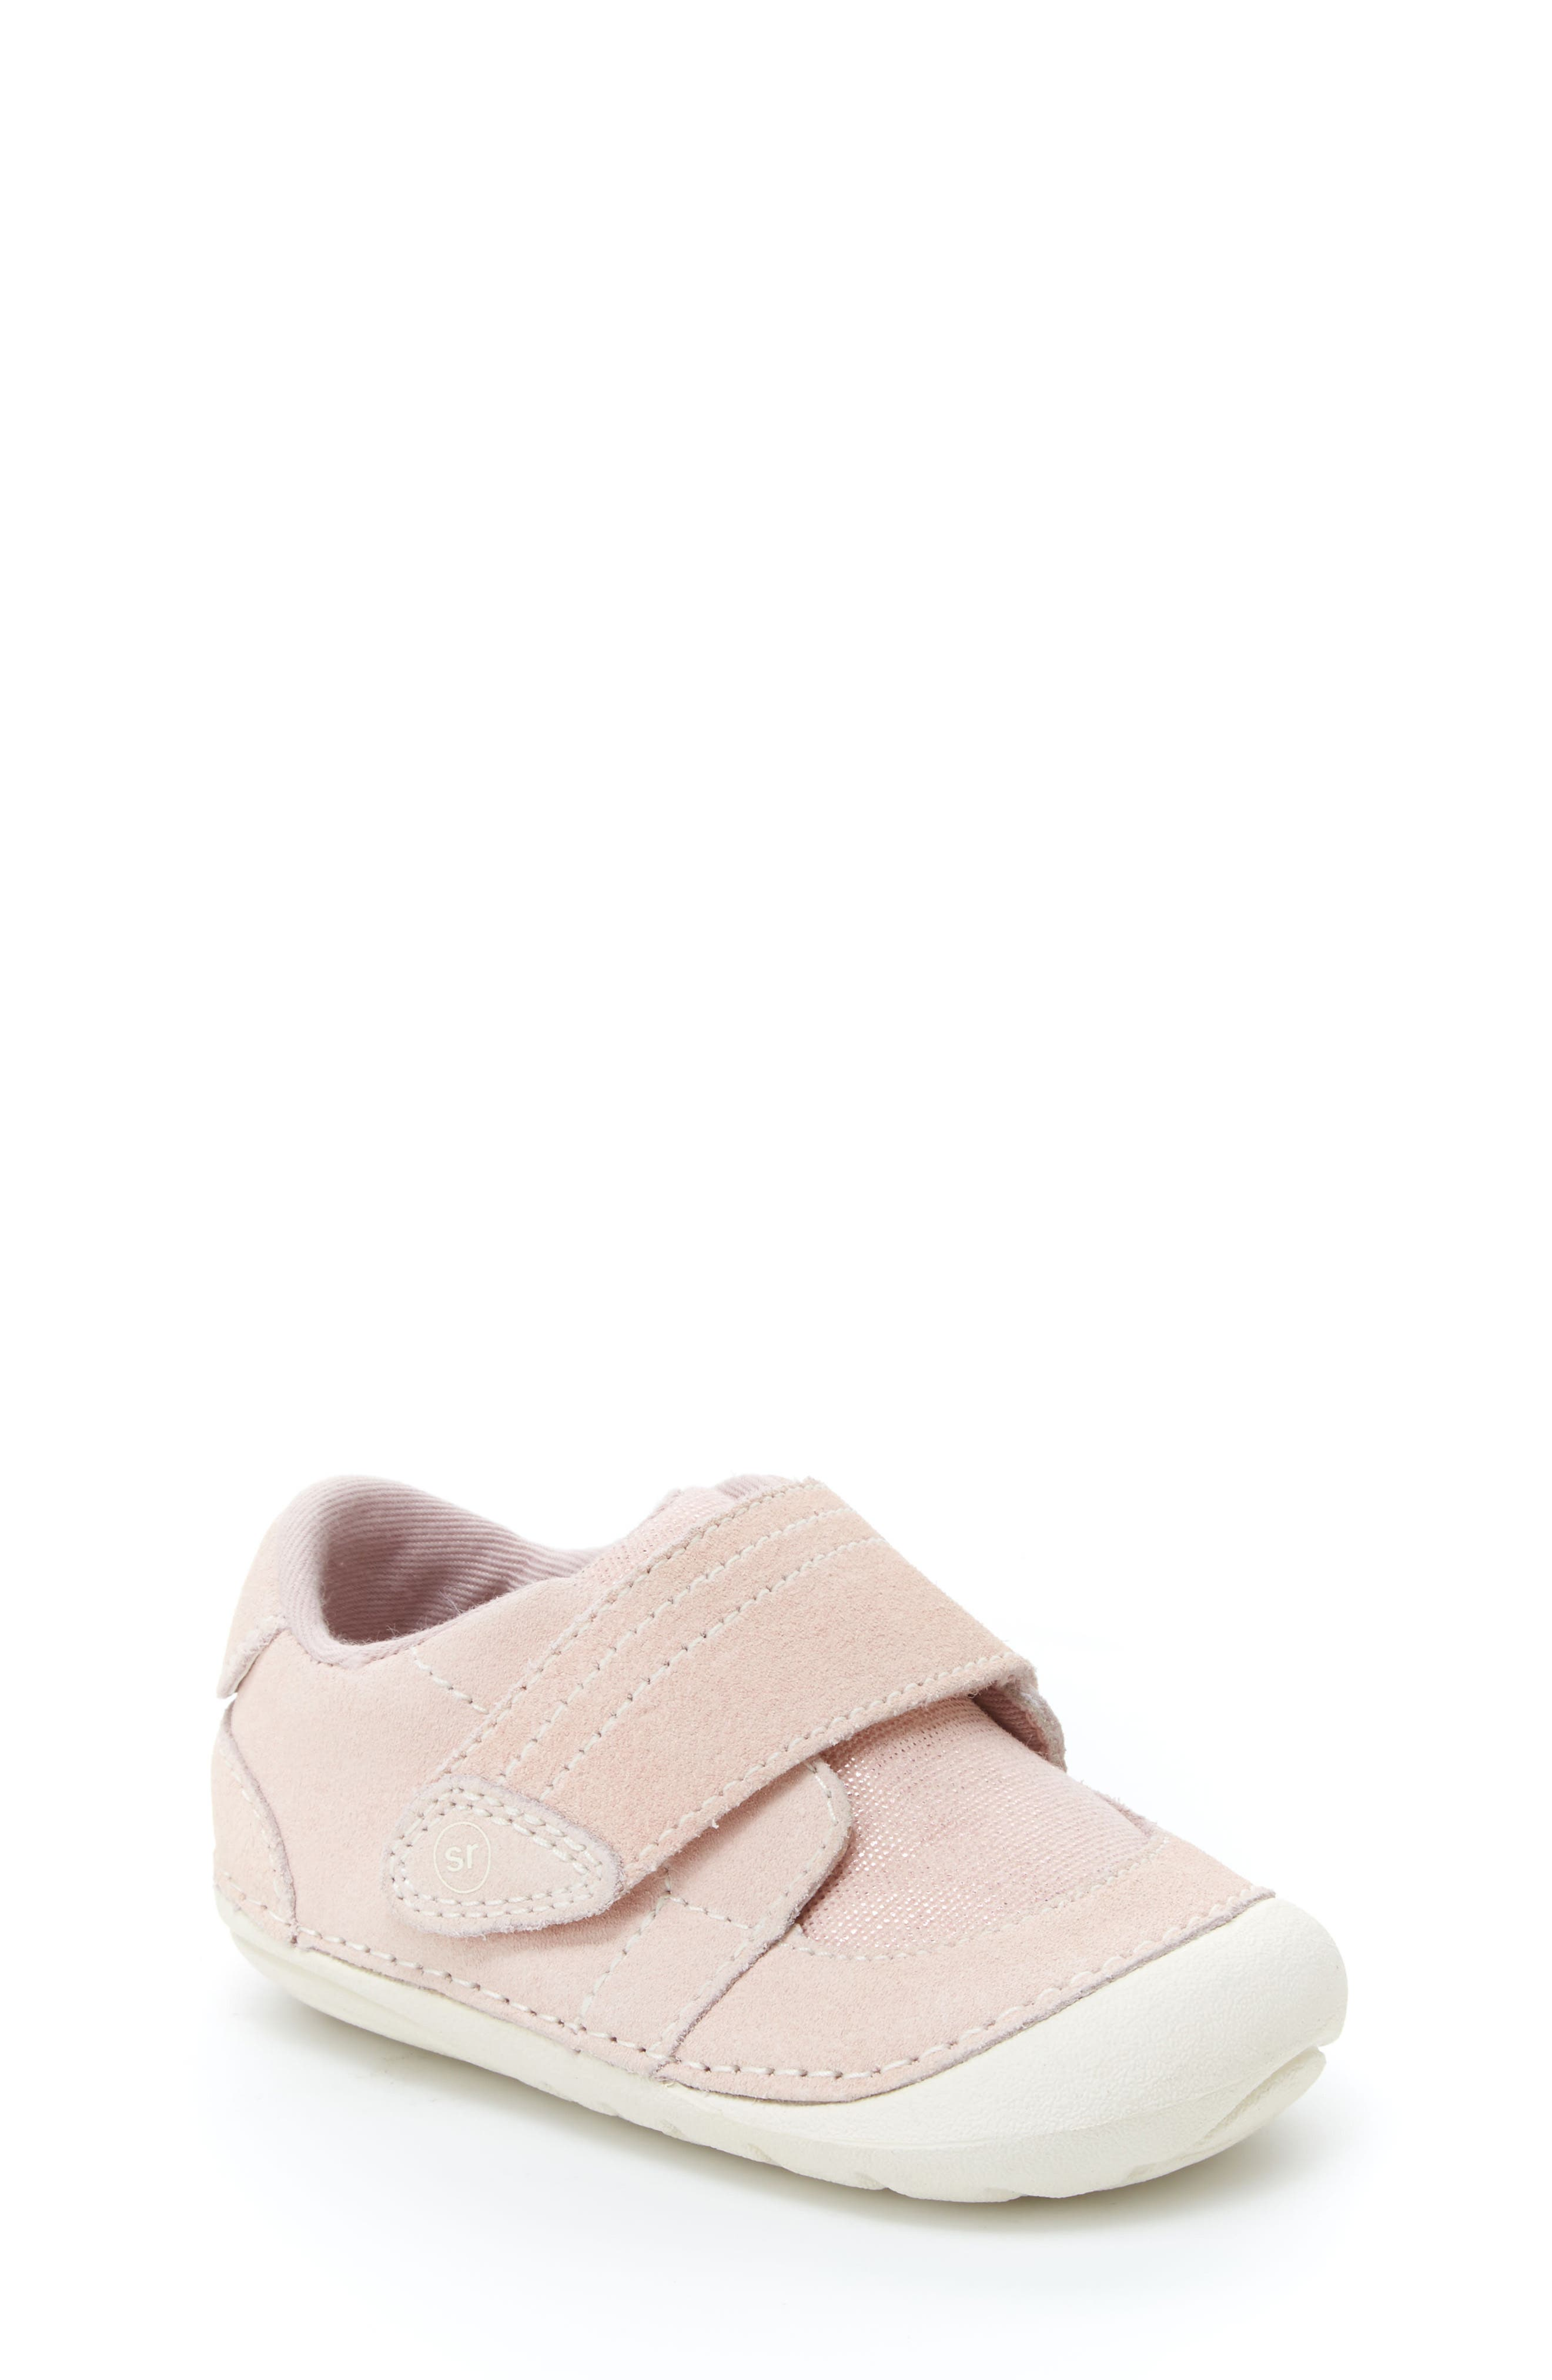 Soft Motion Kellen Sneaker,                             Main thumbnail 1, color,                             650